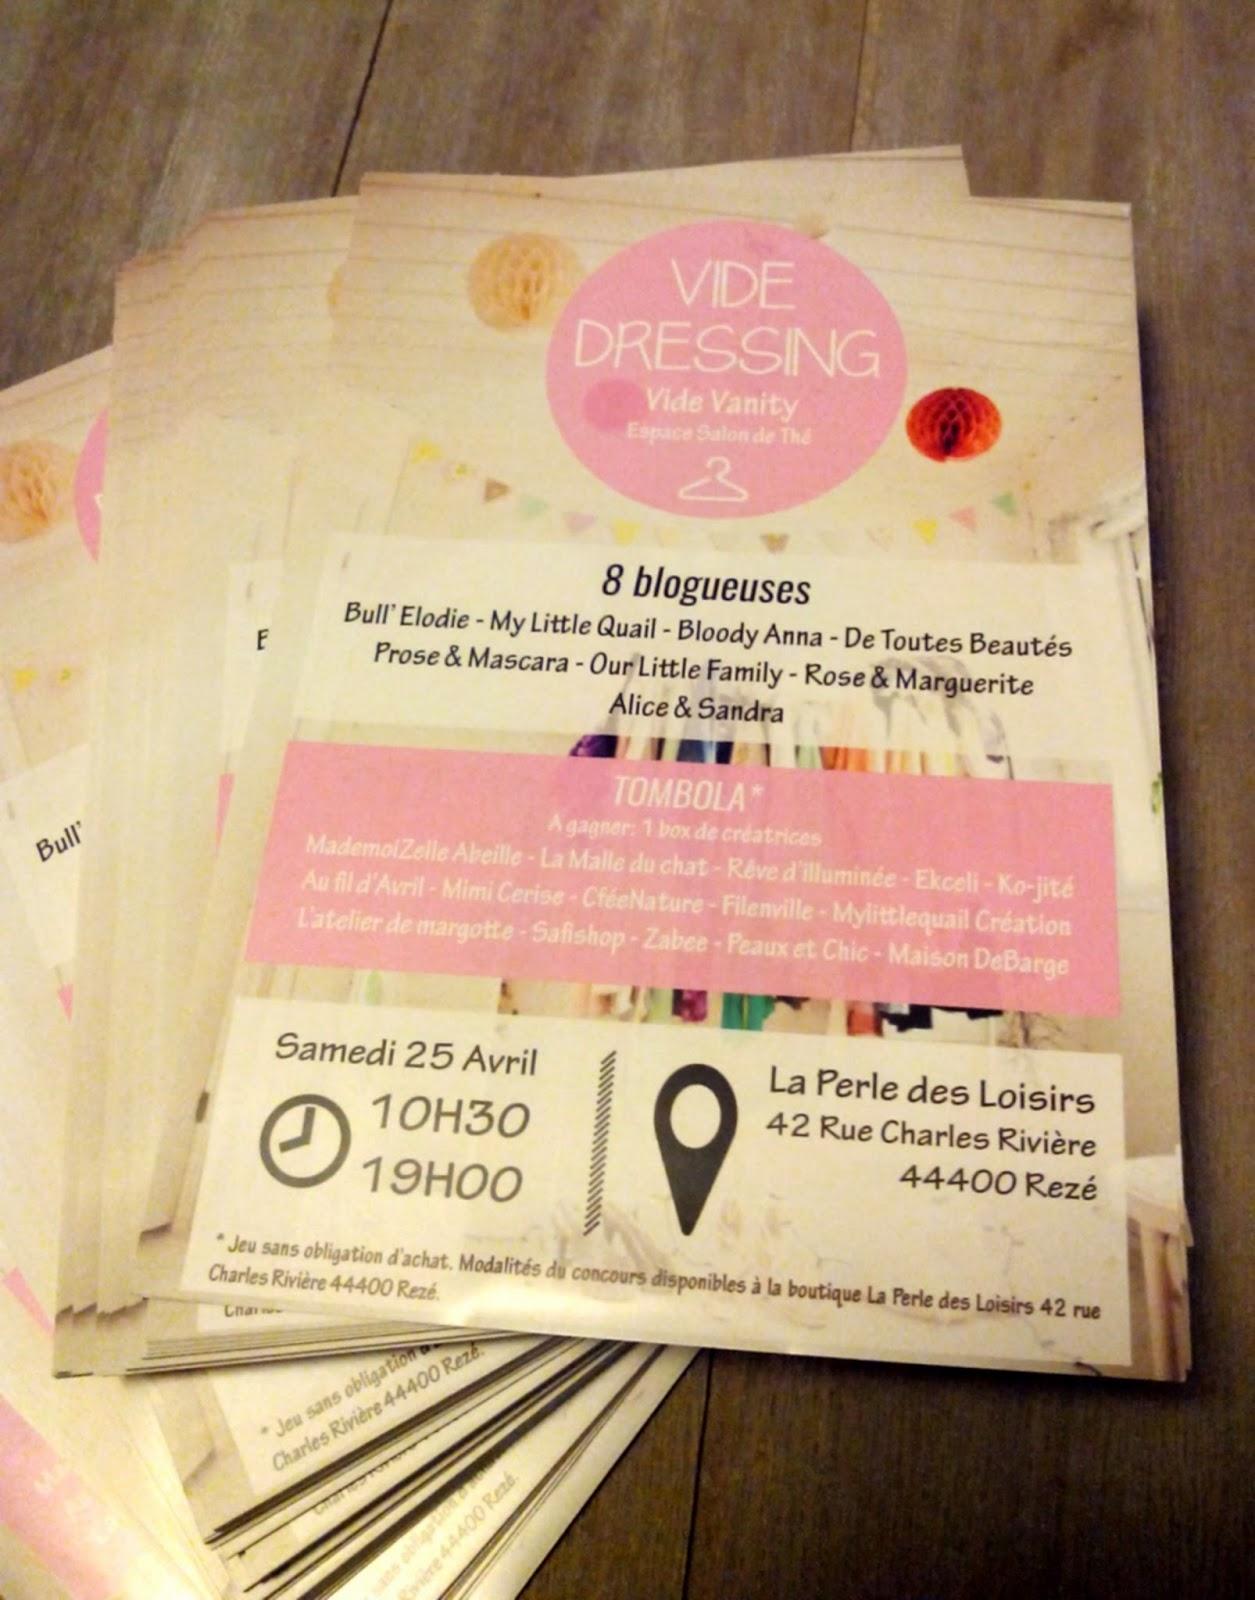 flyers, vide-dressing, vide-vanity, blog, blogueuses, shopping, bullelodie